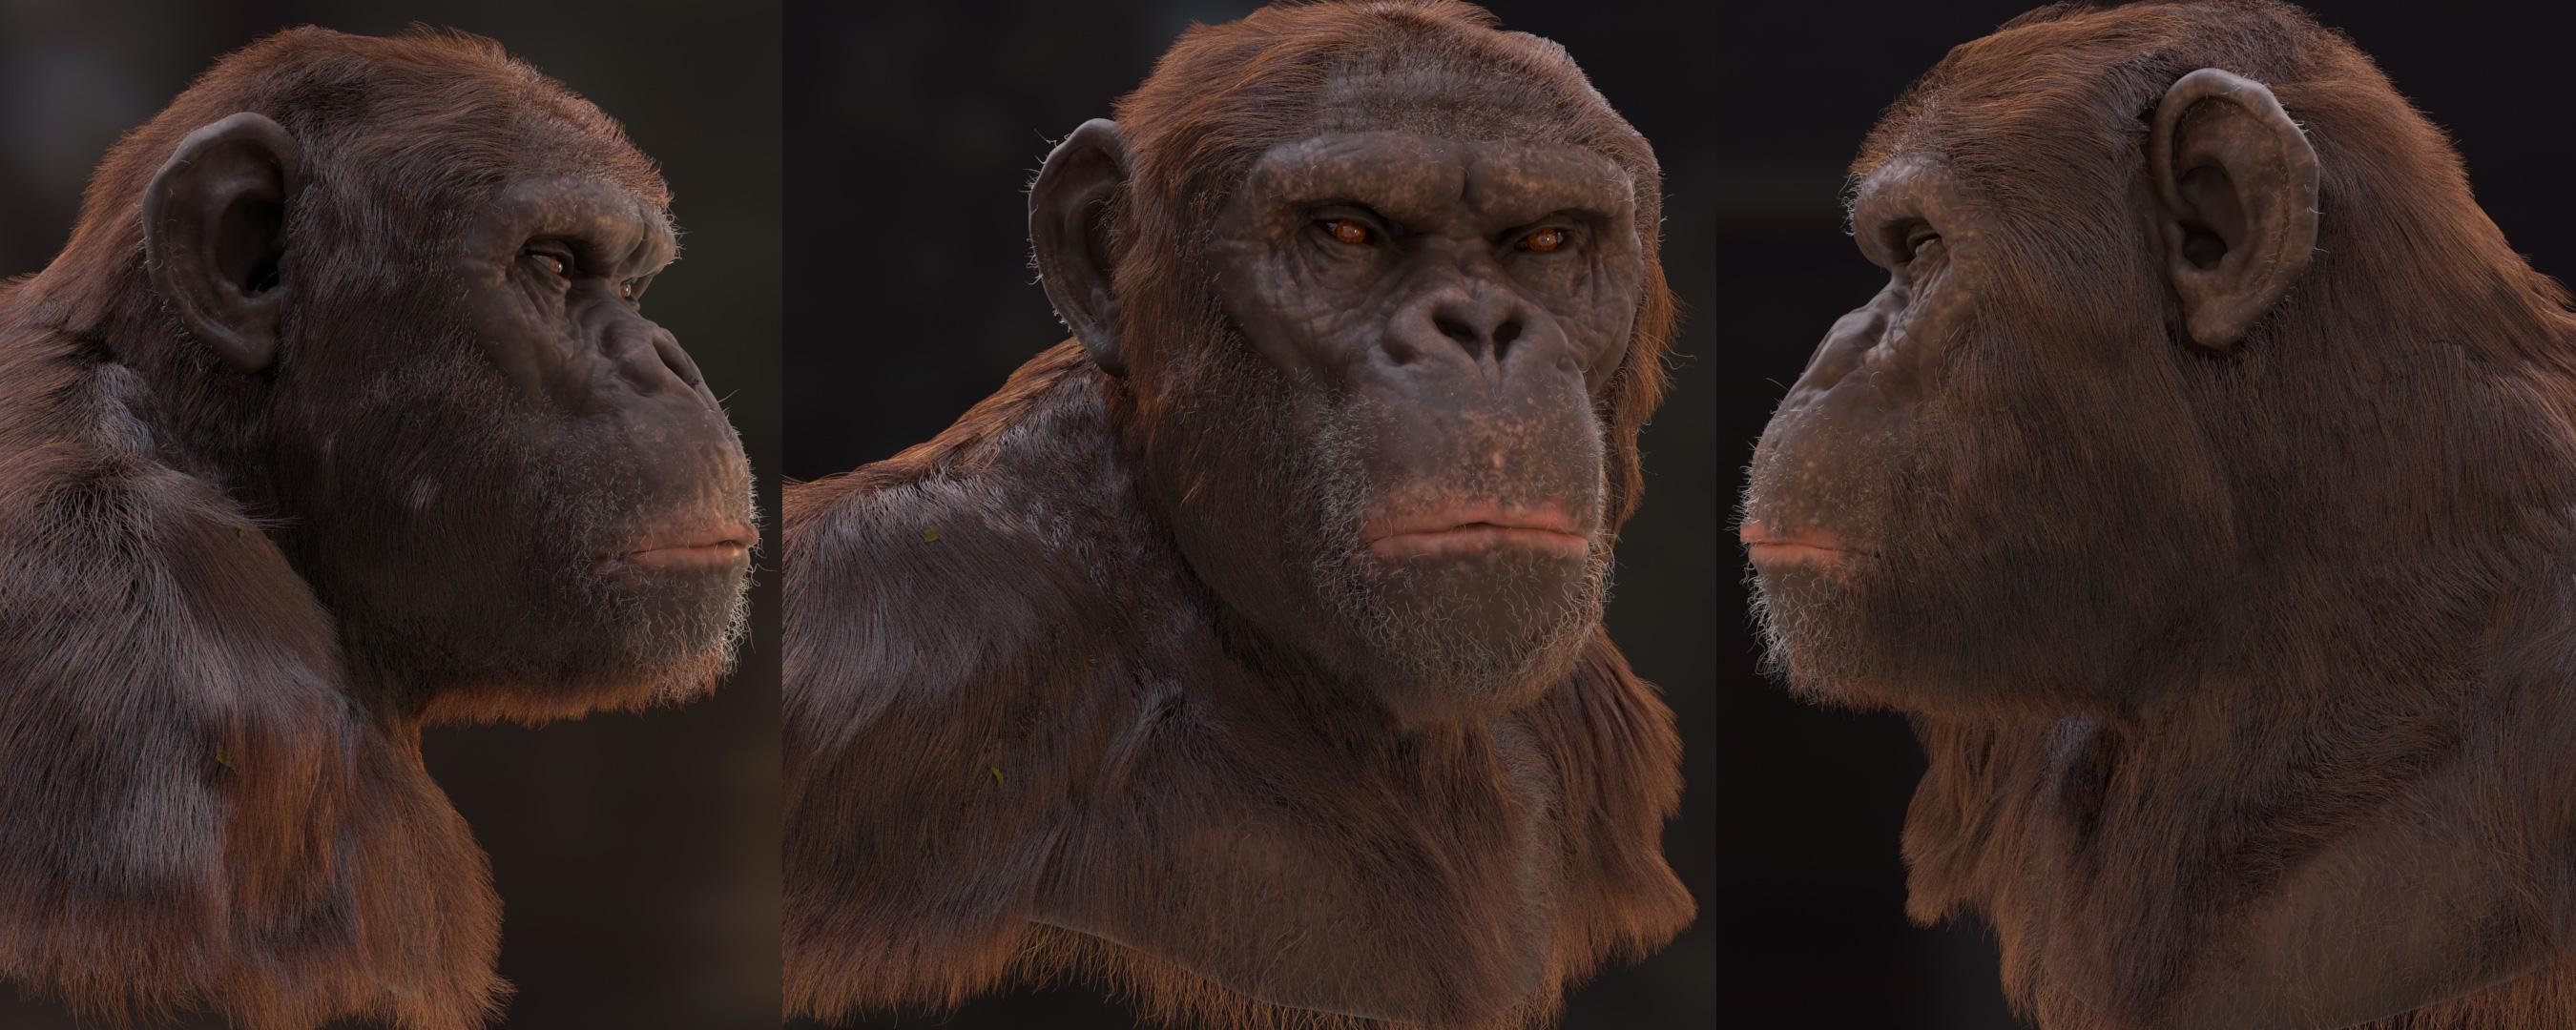 chimp_banner